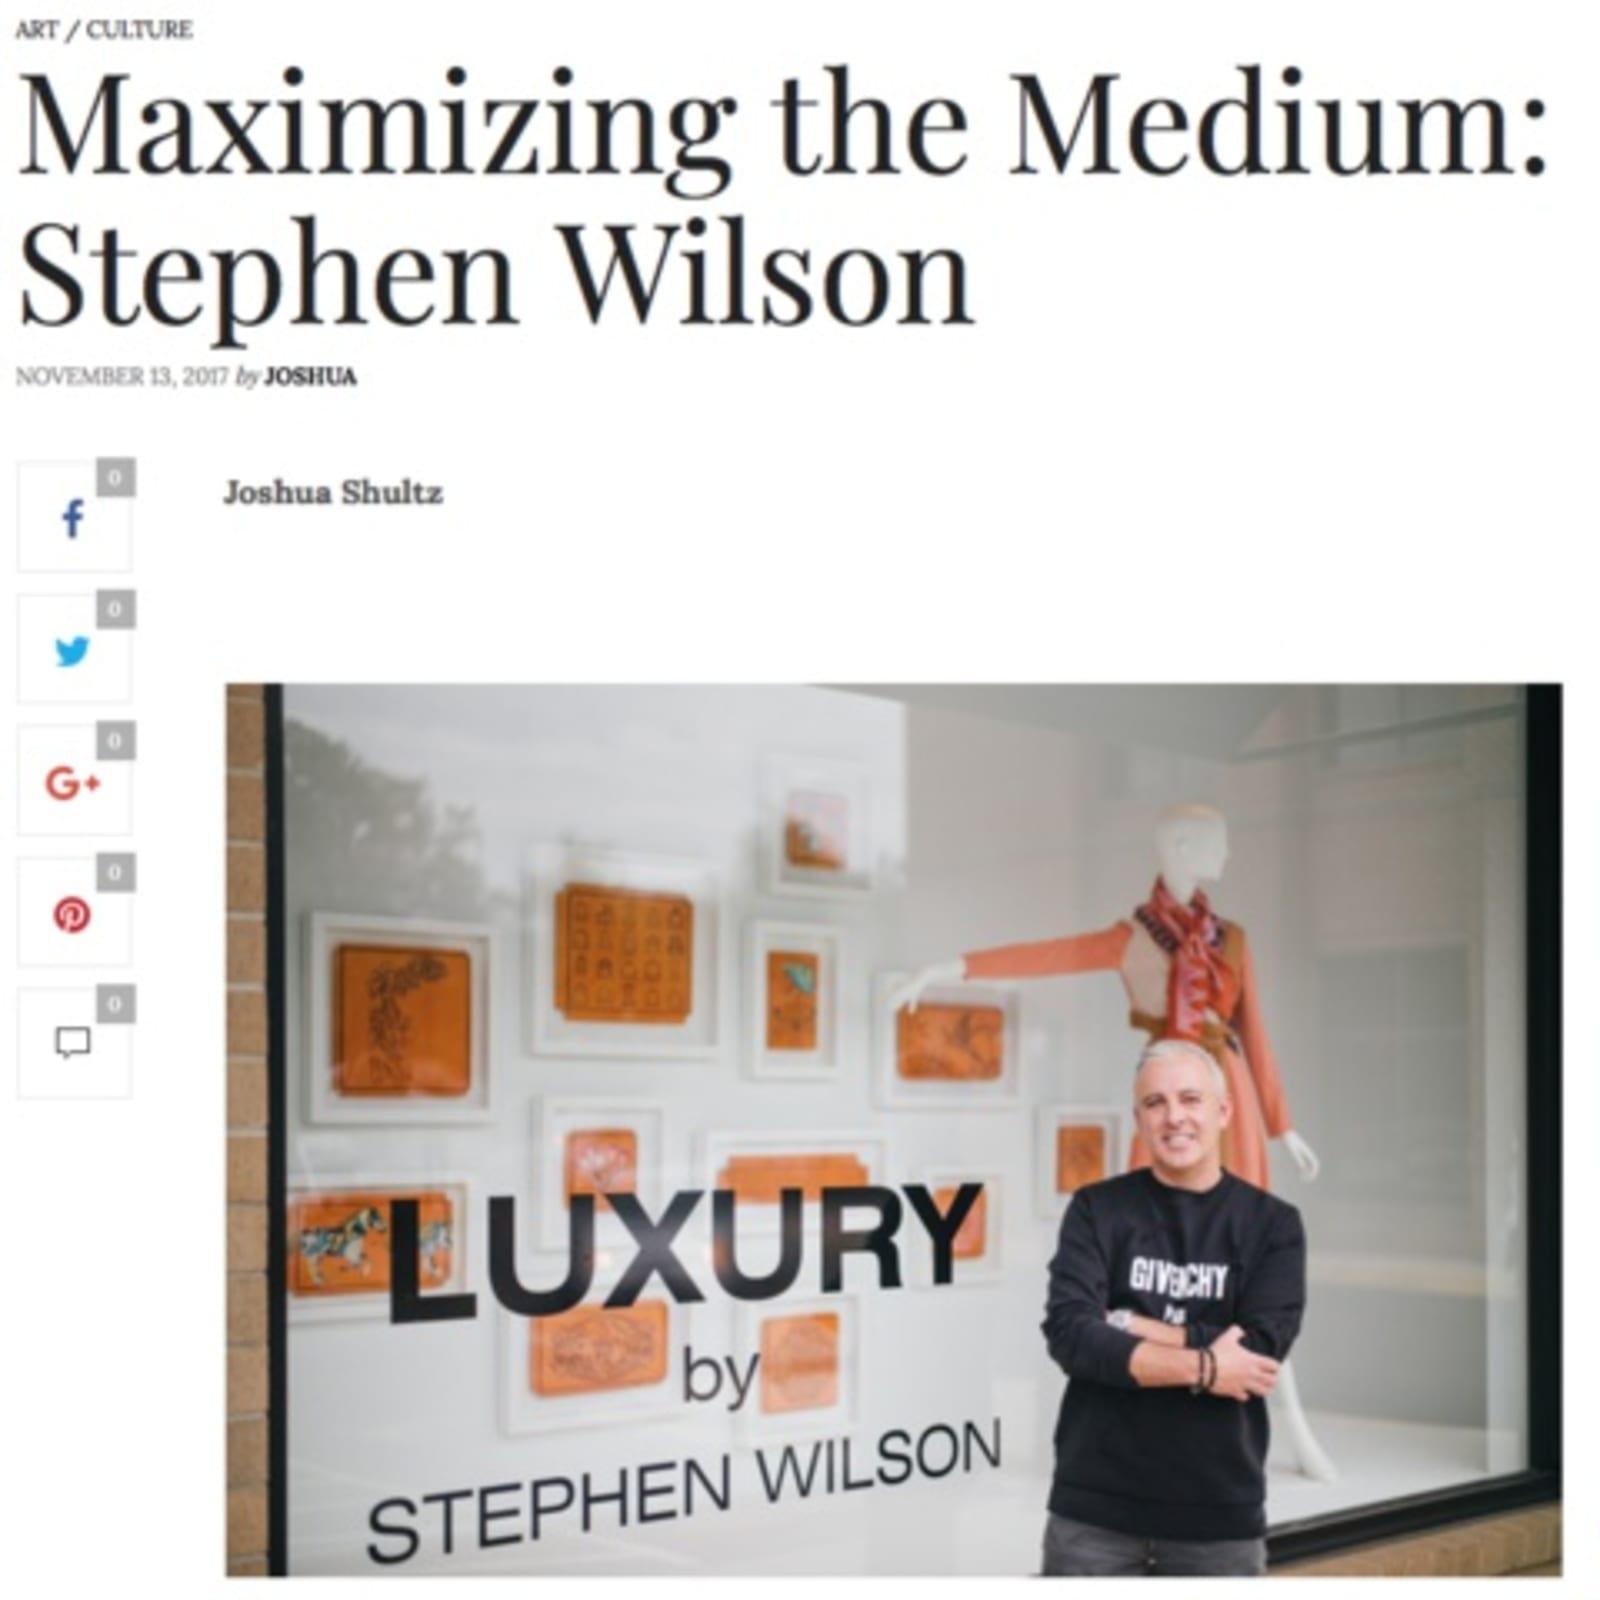 Maximizing the Medium: Stephen Wilson